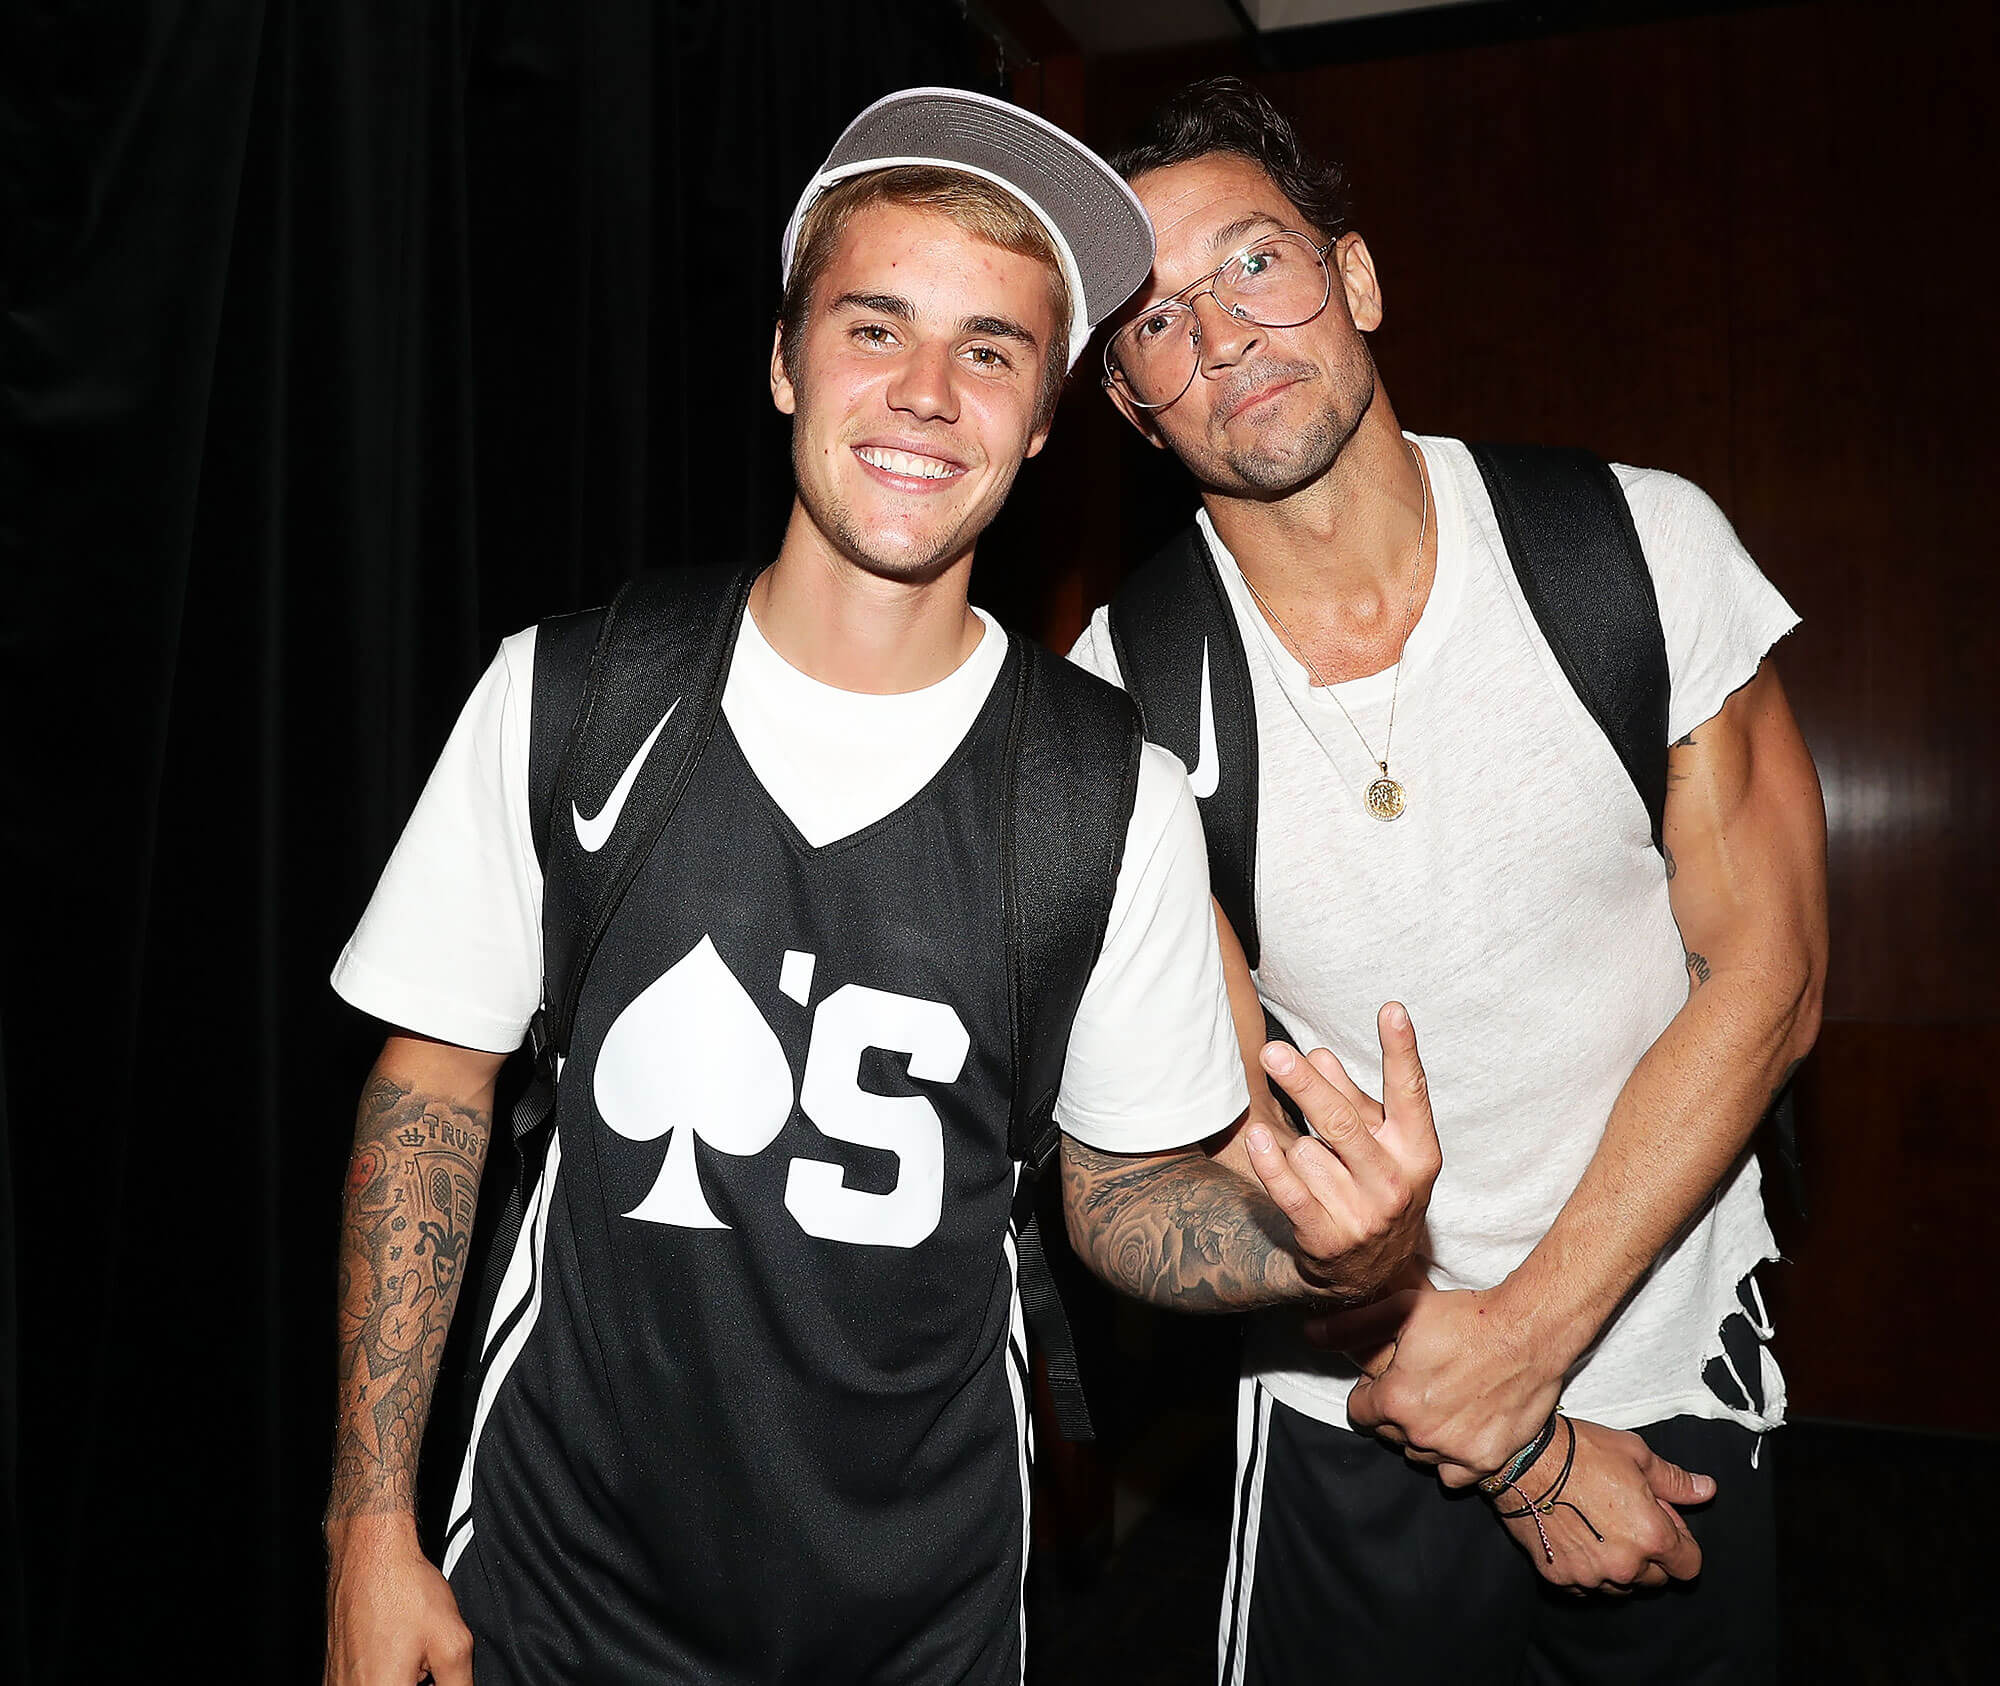 Justin Bieber e Carl Lentz